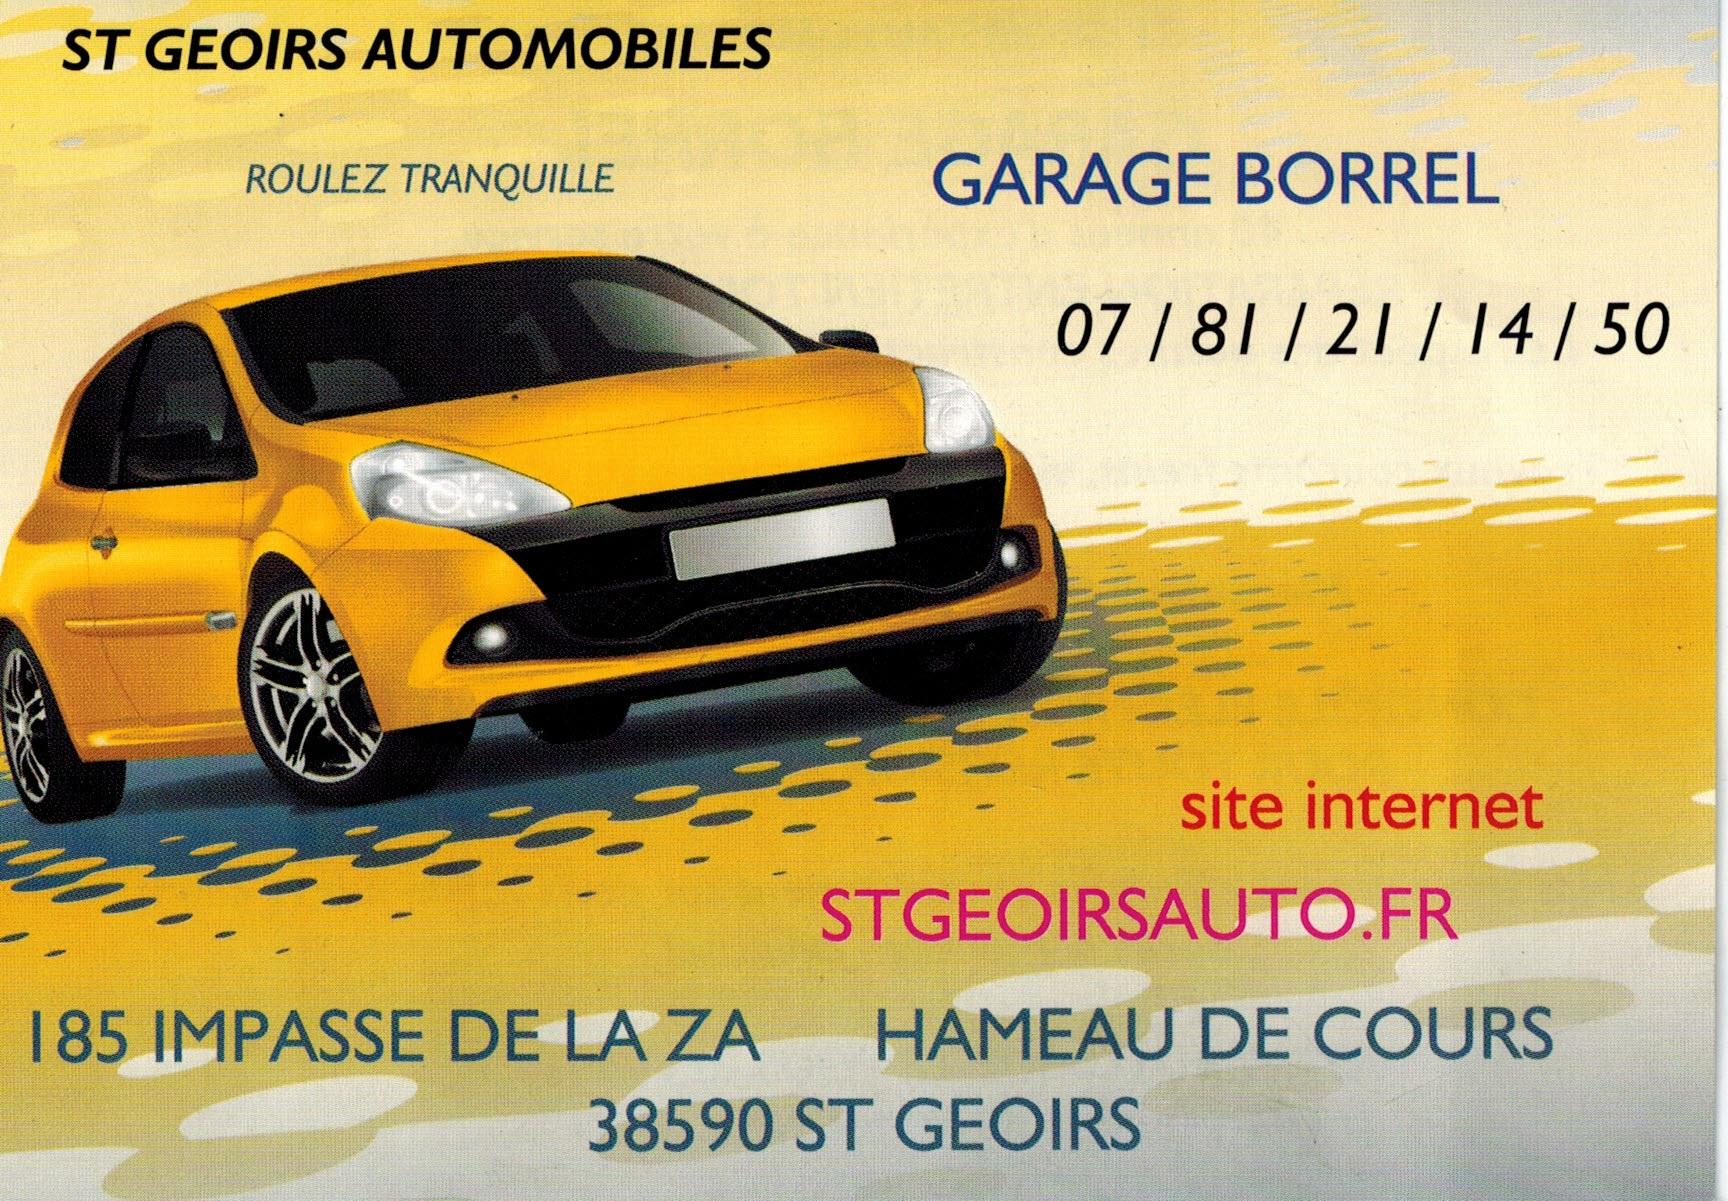 GARAGE BORREL ST GEOIRS AUTOMOBILES